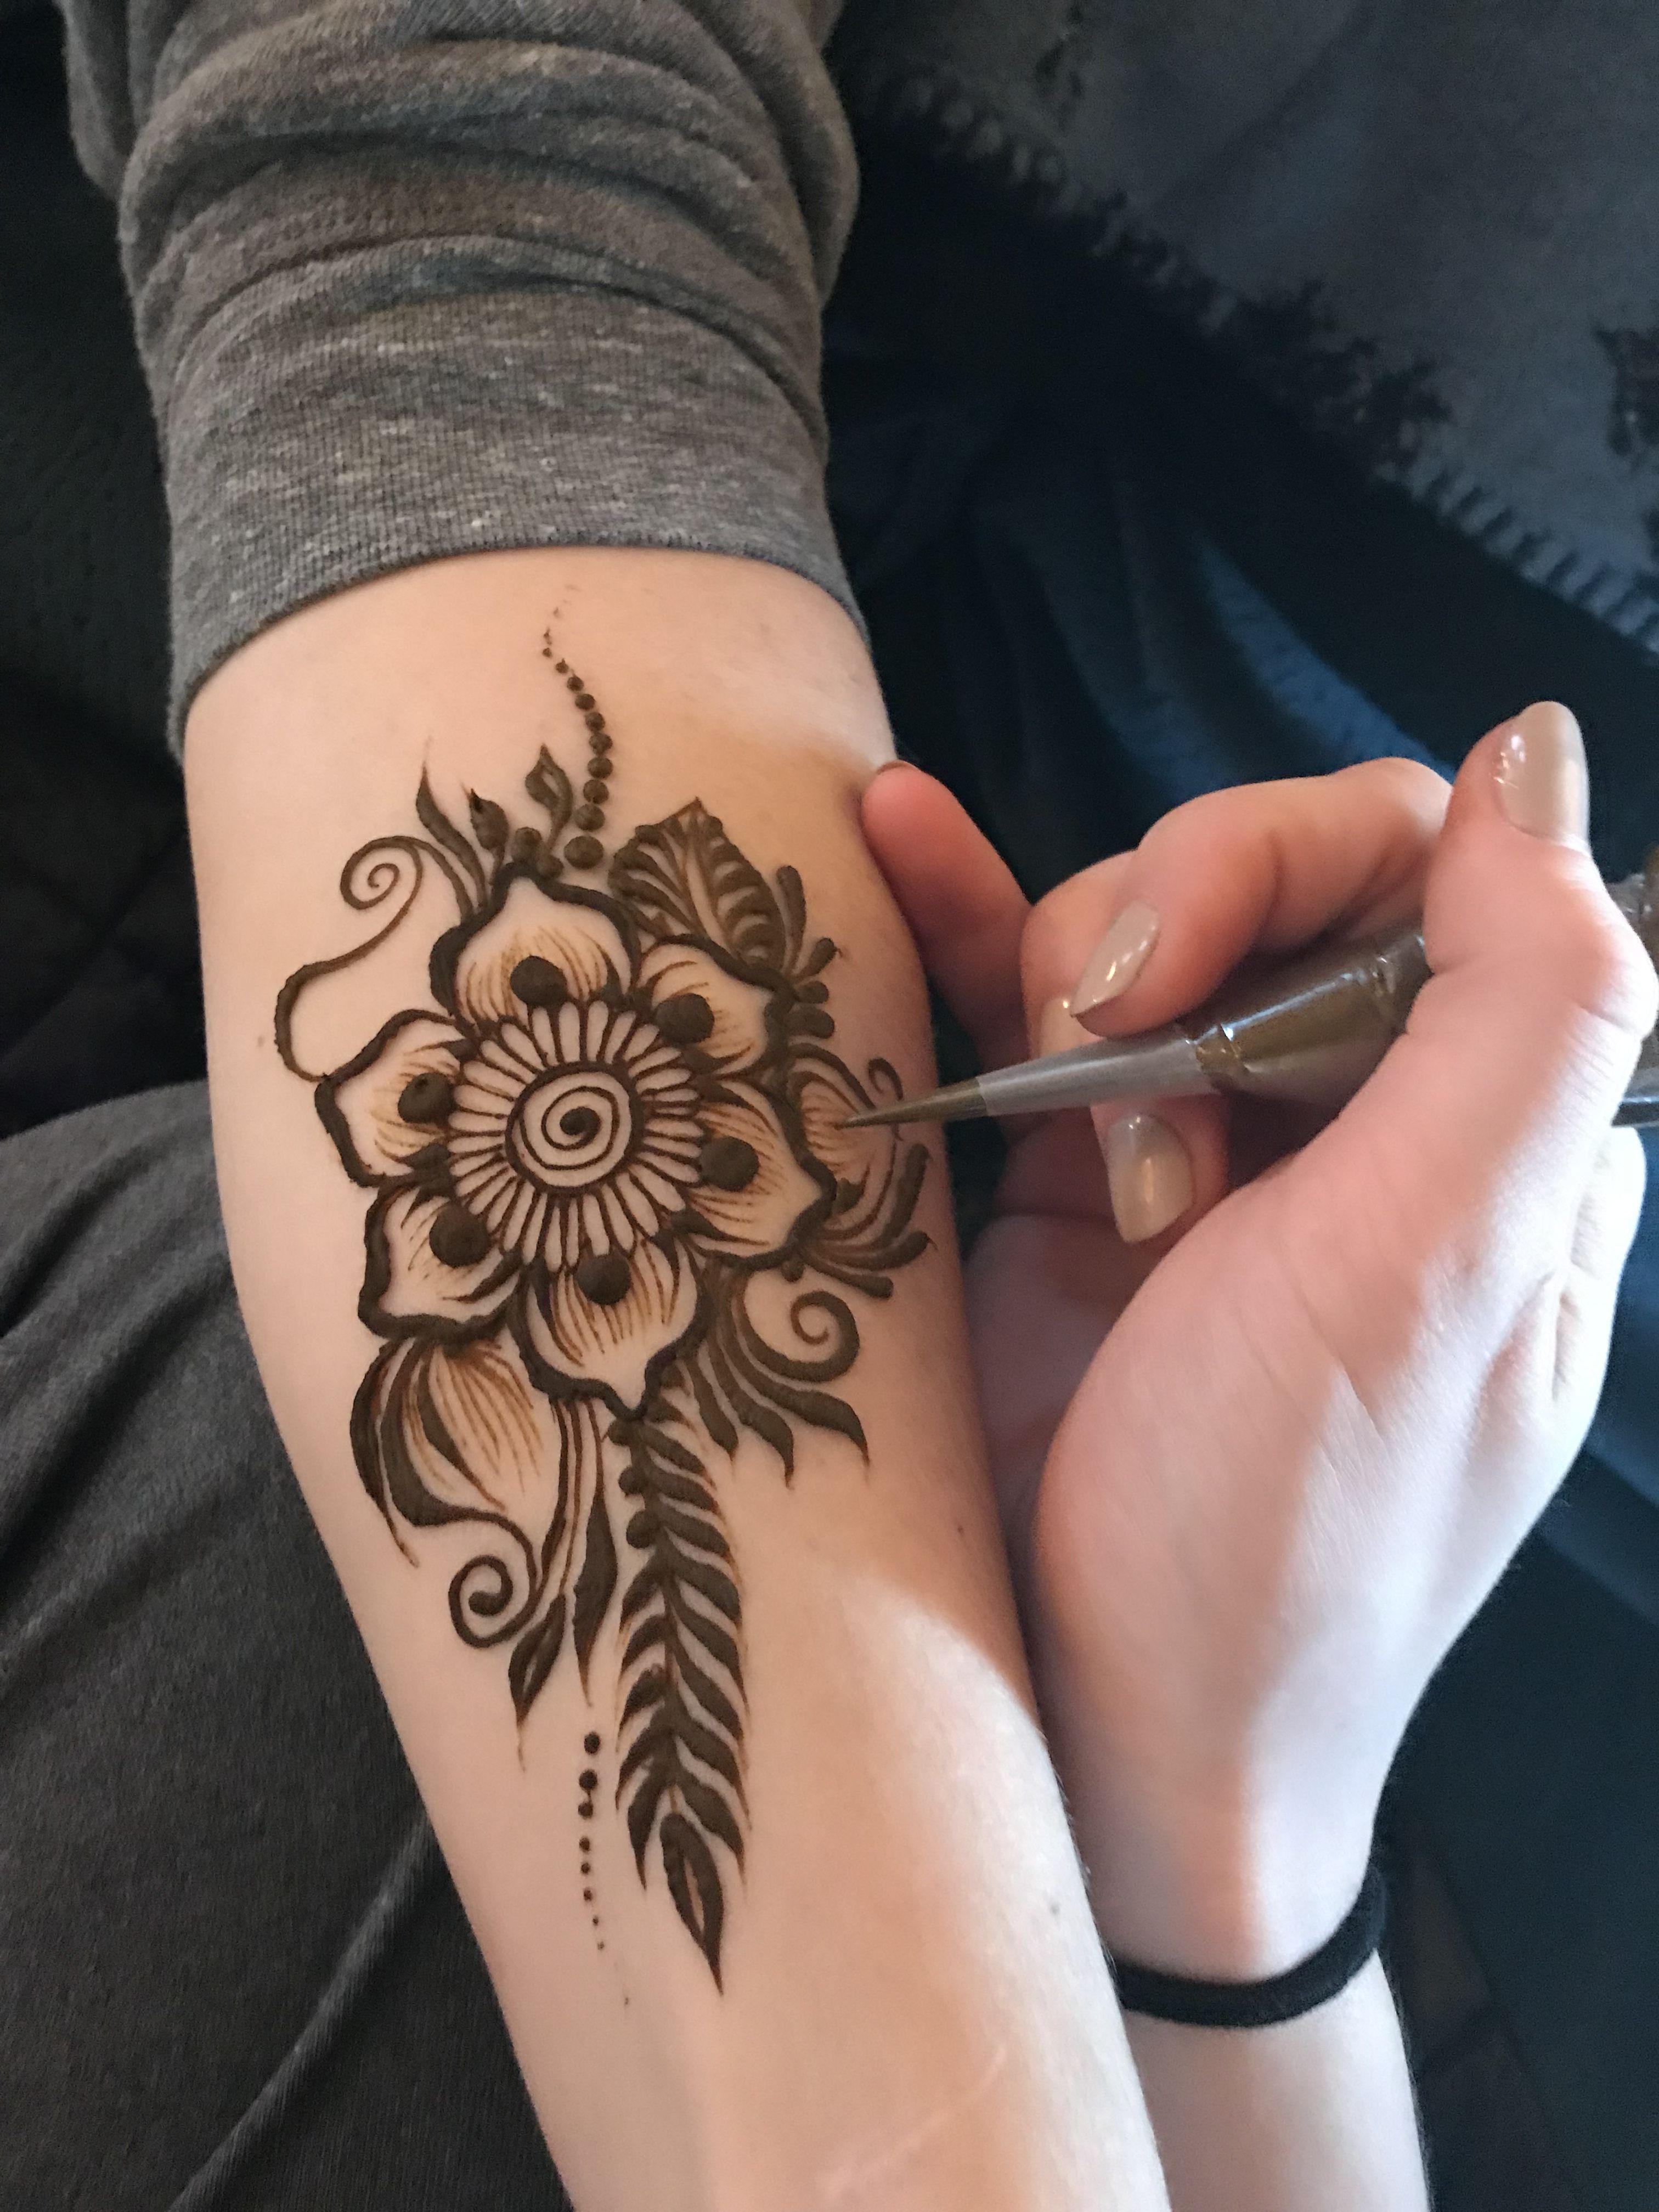 Simple mehndi designs for hands also best design images henna patterns tattoos rh pinterest